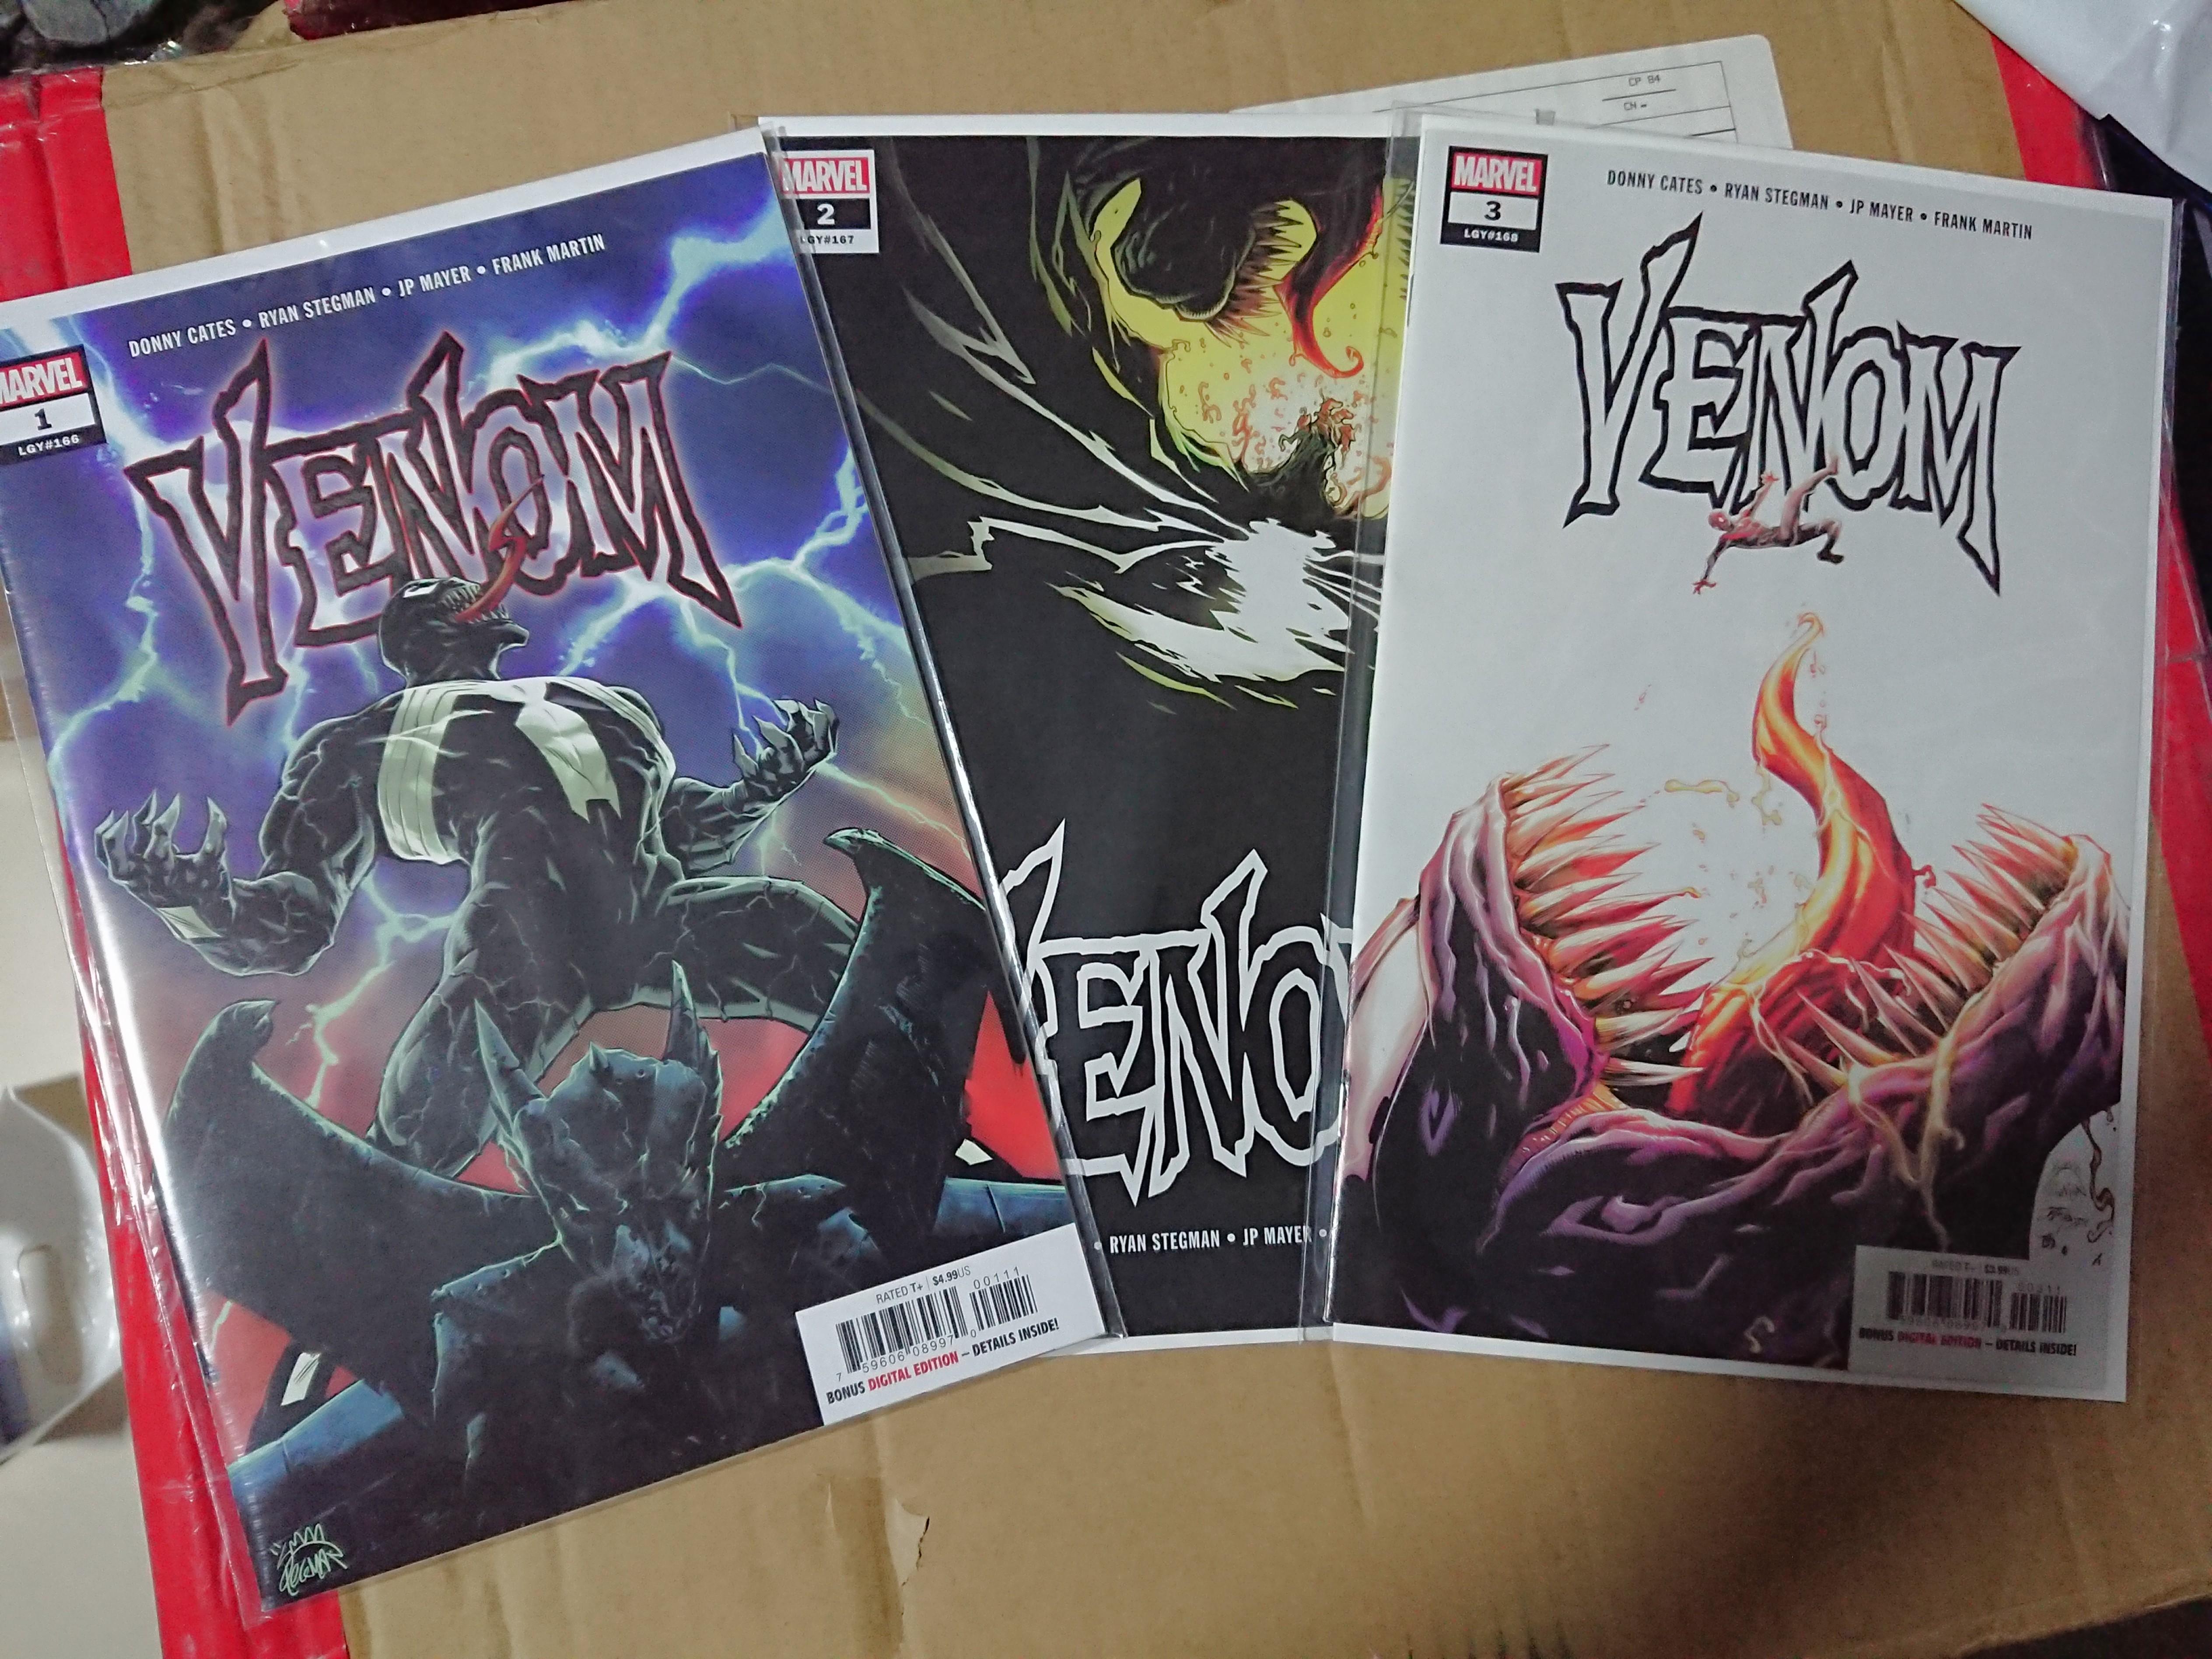 Marvel Venom 2018 comics Issue 1,2,3